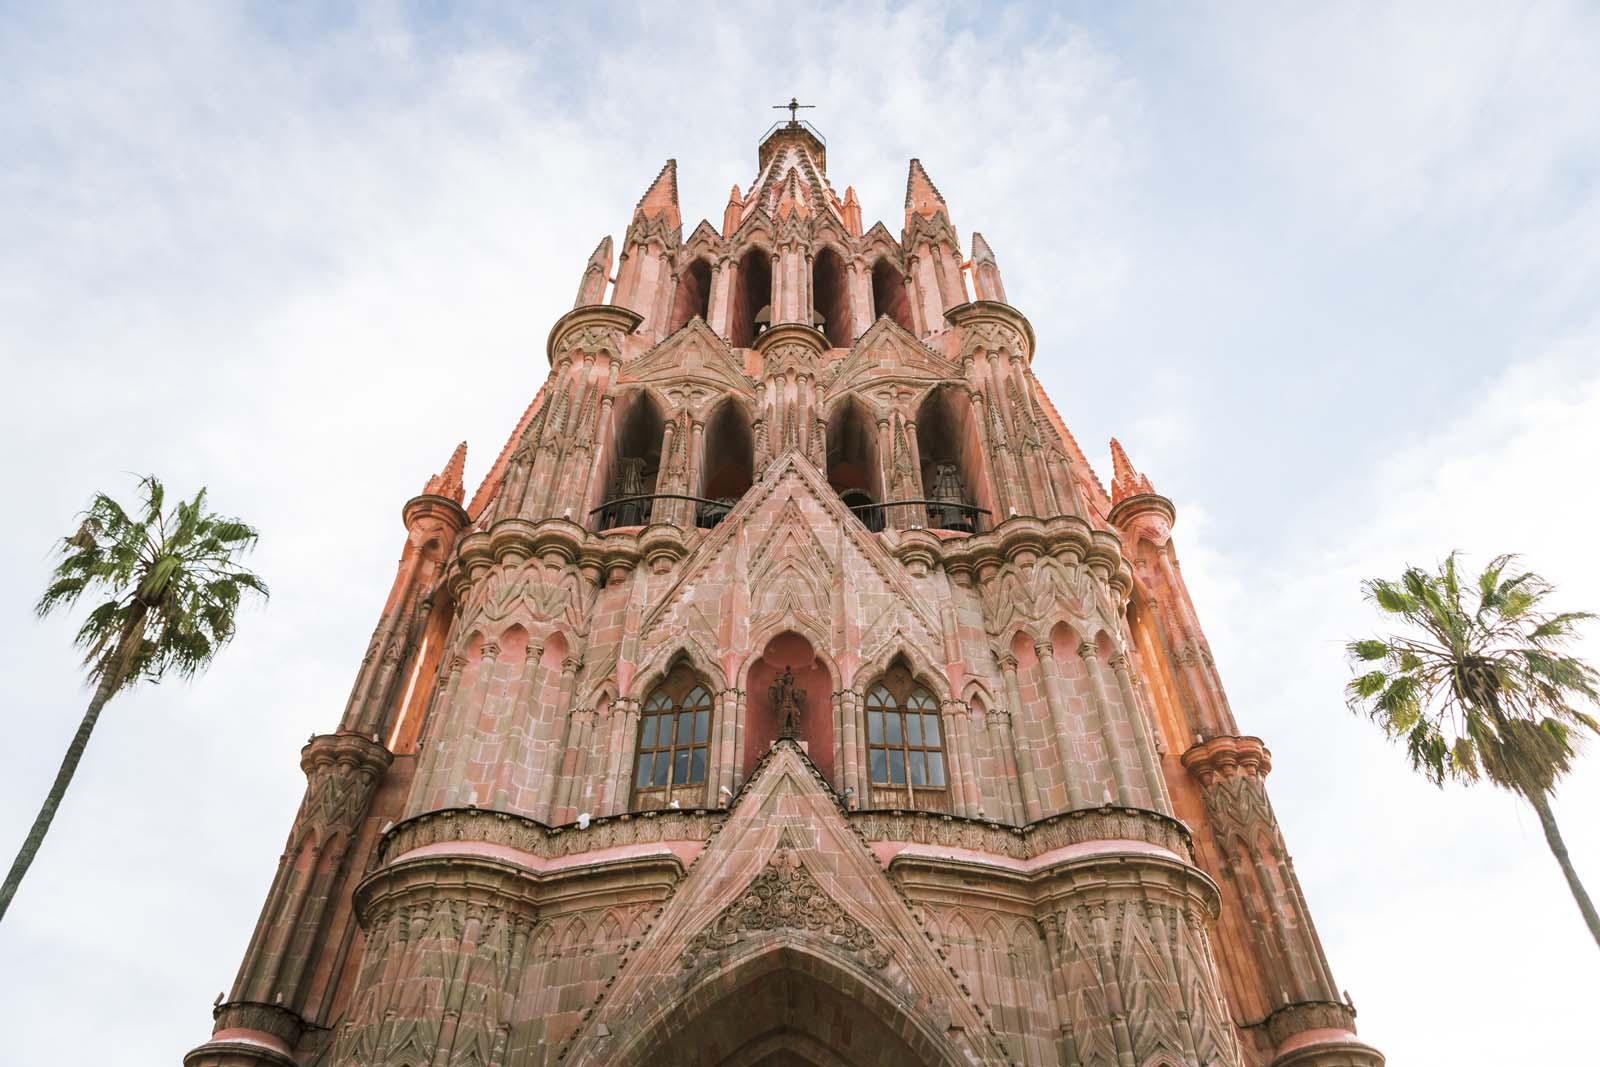 Church of St. Michael the Archangel in San Miguel de Allende